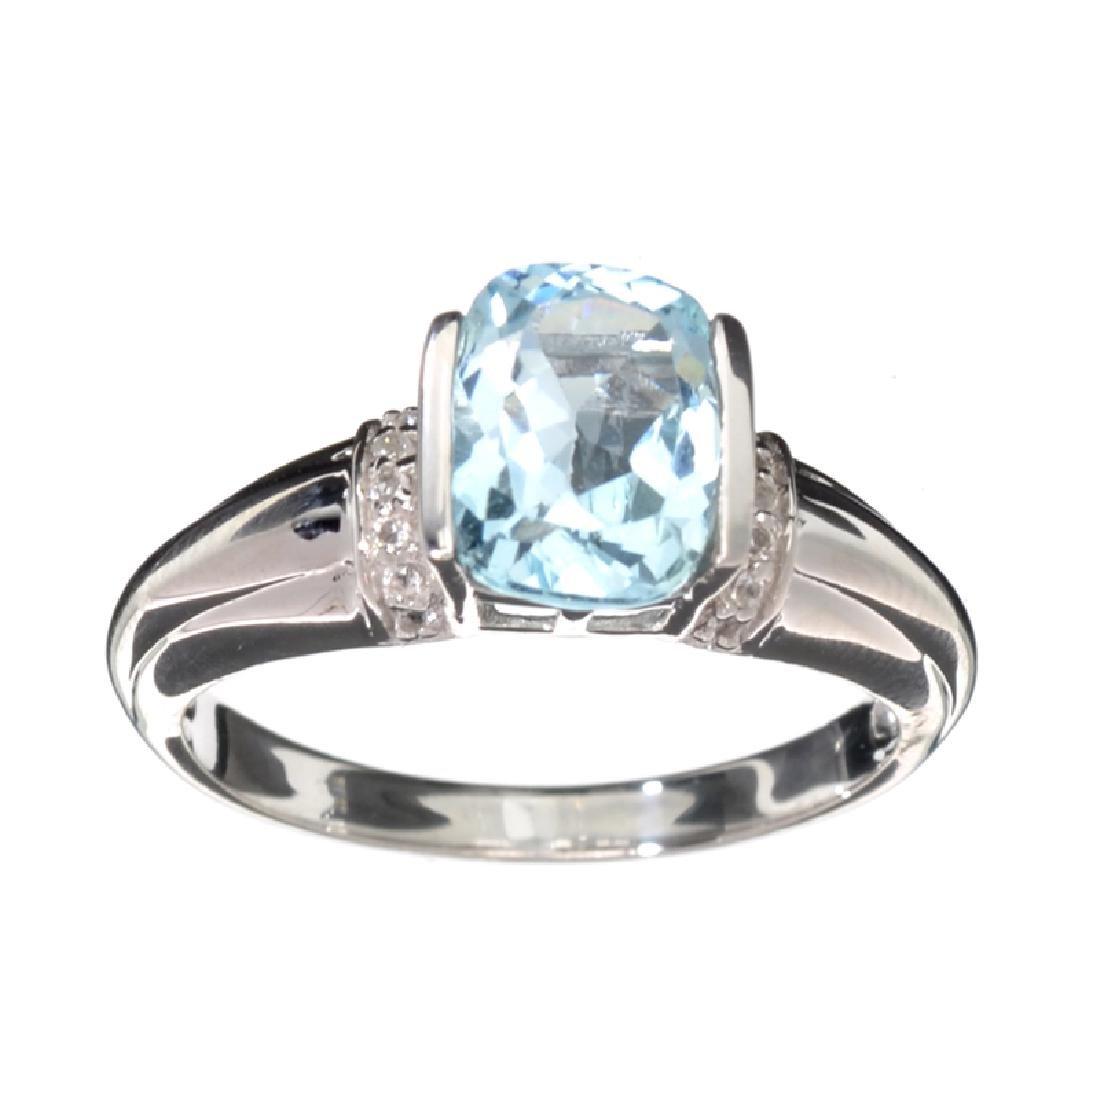 APP: 0.4k Fine Jewelry 2.53CT Blue Topaz And White